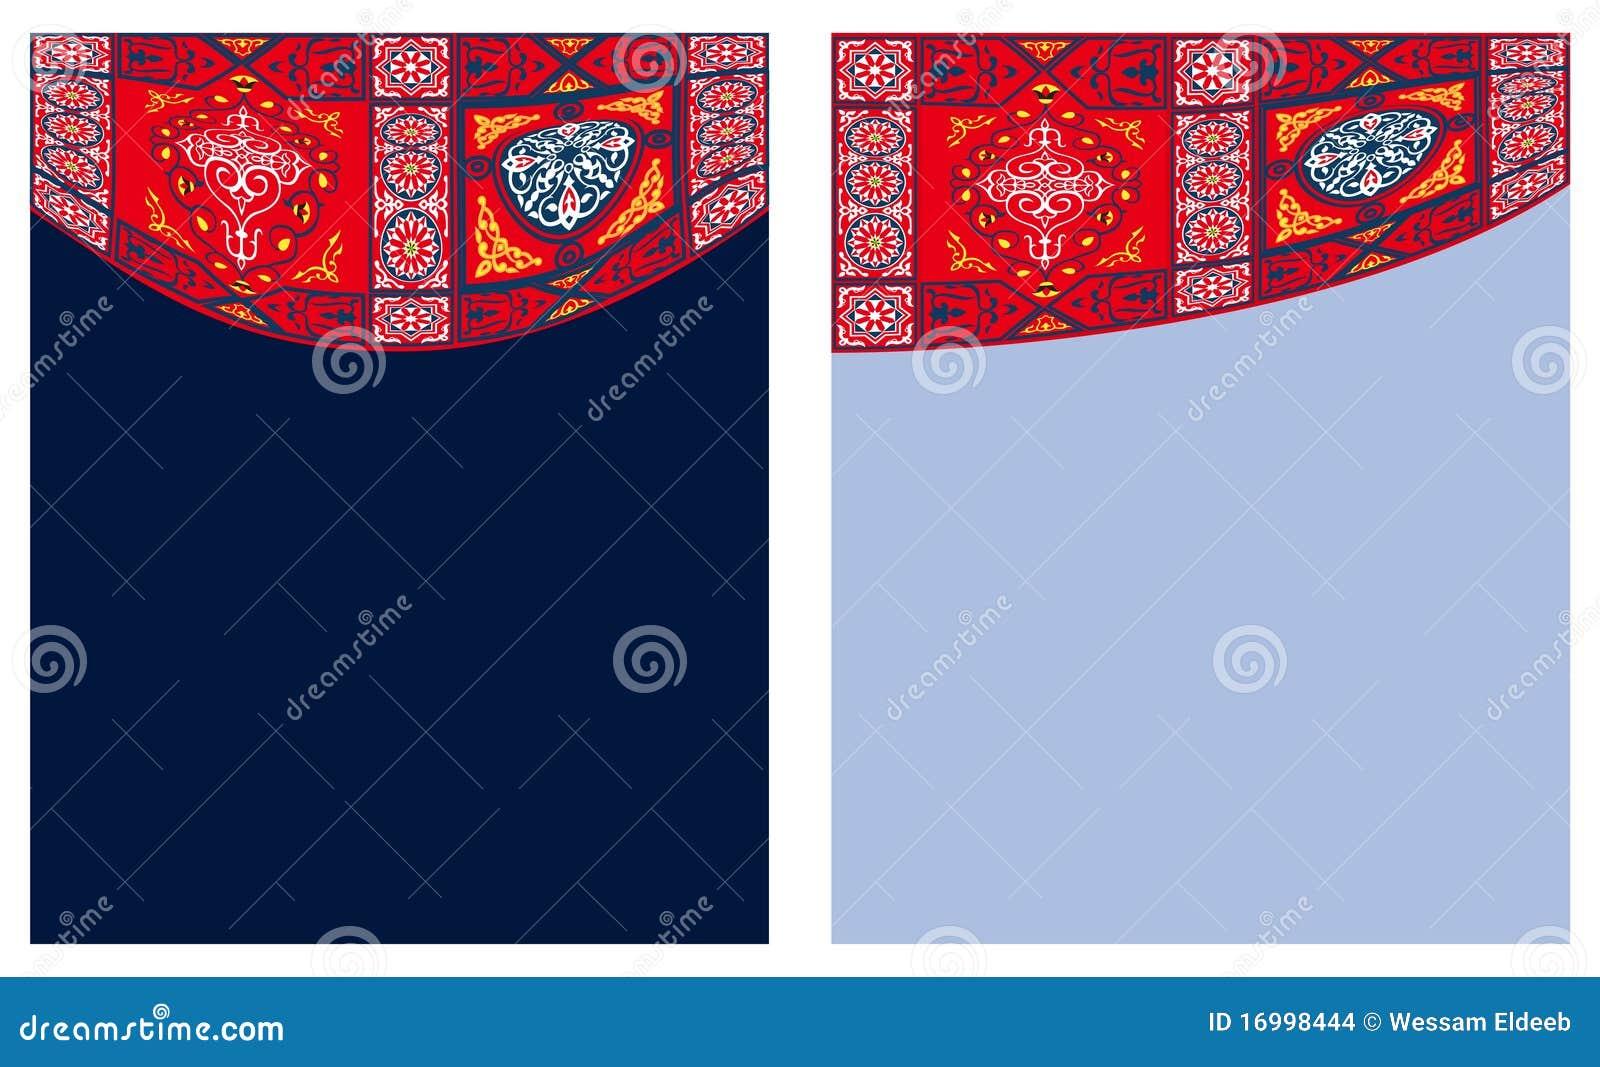 egyptian tent fabriccurtain style 3 stock vector image